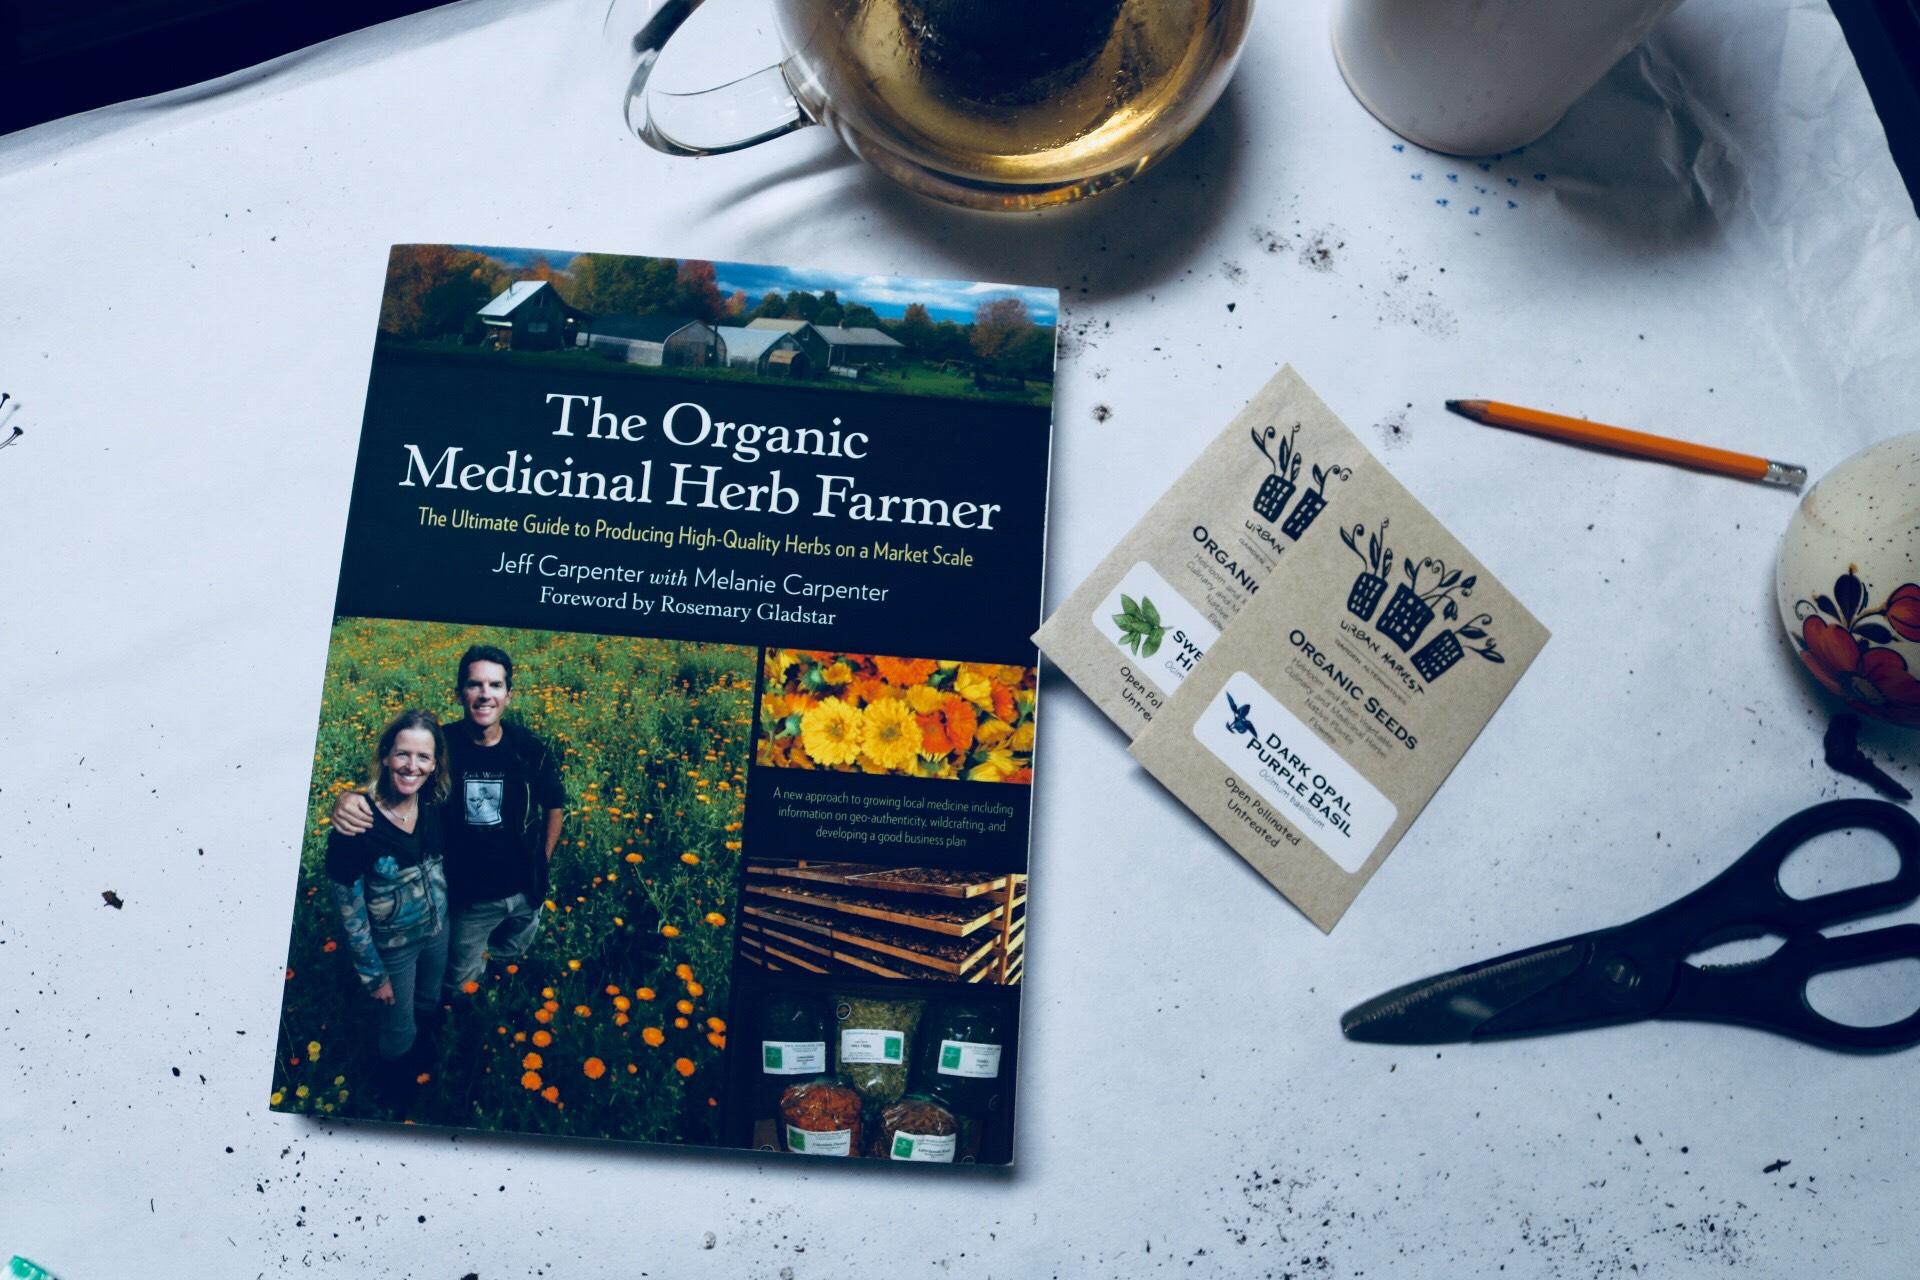 The Organic Medicinal Farmer